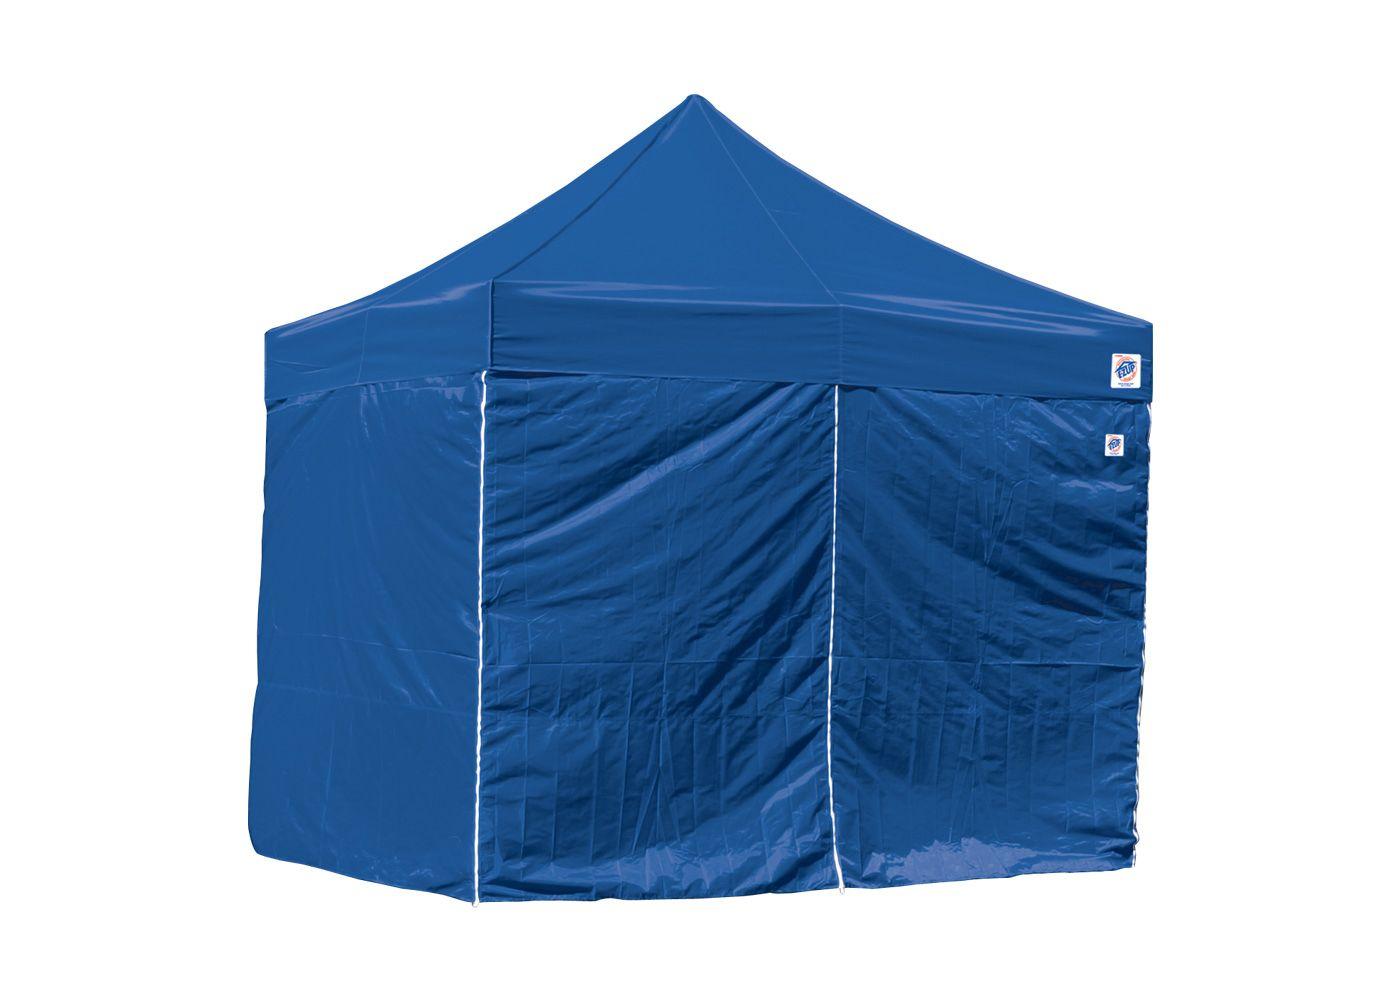 E-Z UP 10' x 10' Duralon Canopy Sidewall 4 Pack